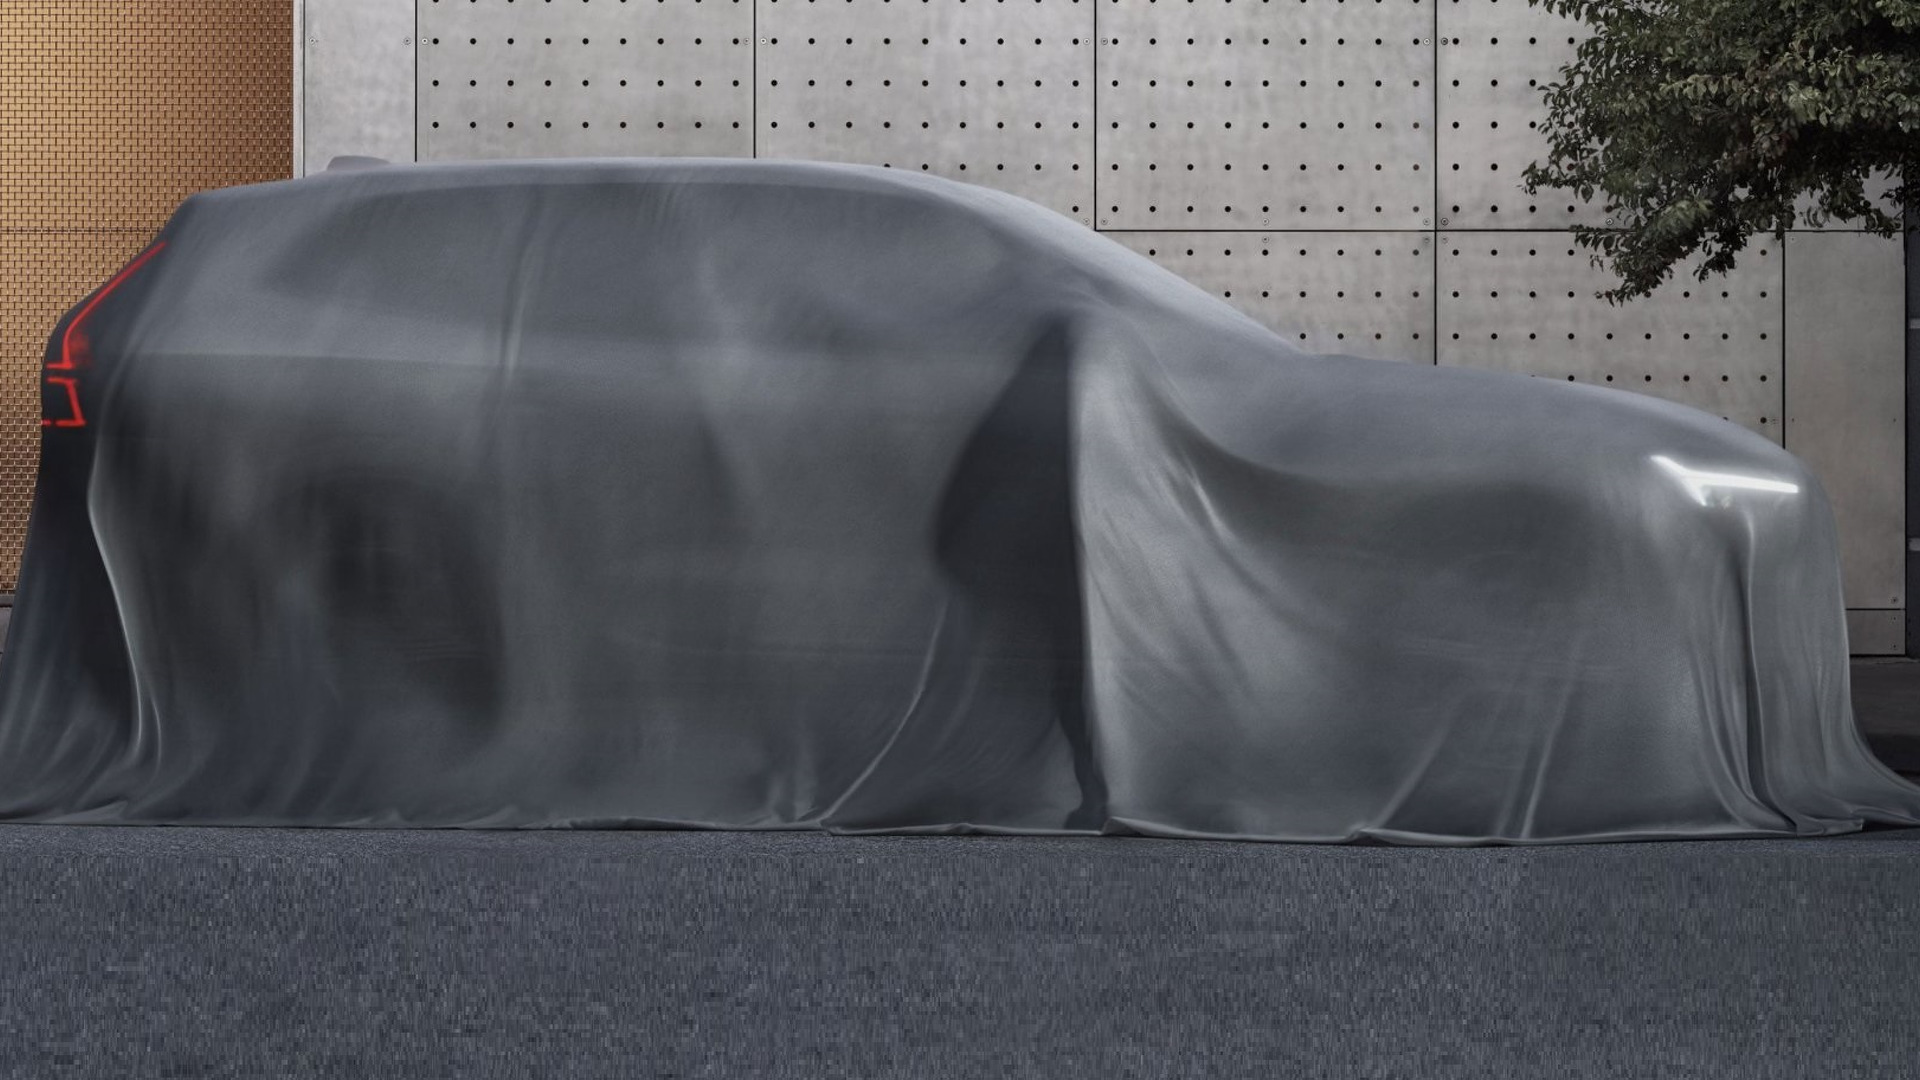 Volvo_XC60_Teaser_04